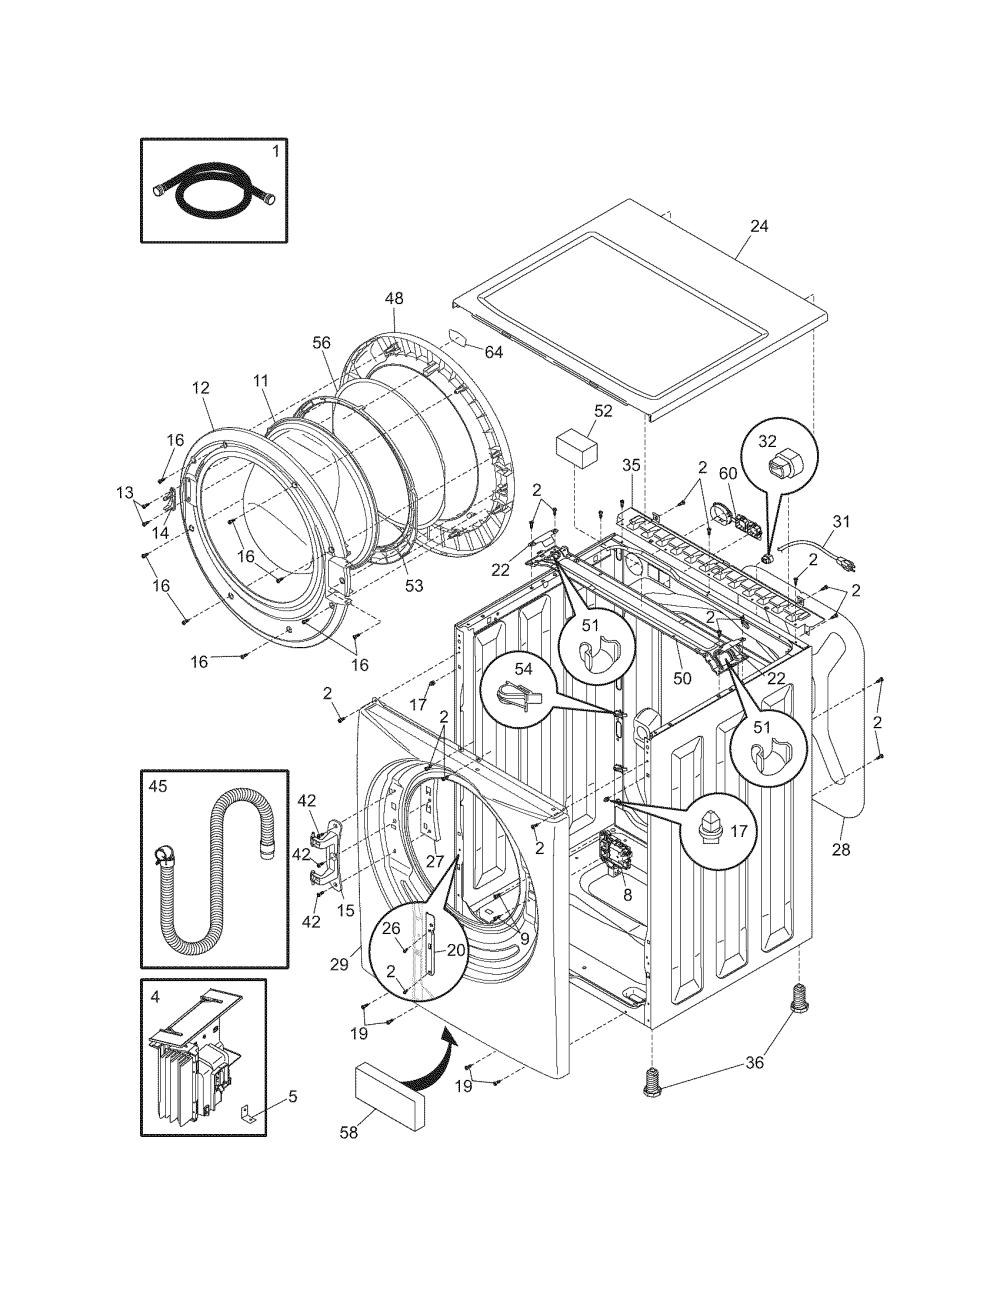 medium resolution of r0602146 00002 frigidaire washer parts model ltf6000es0 sears partsdirect at cita asia